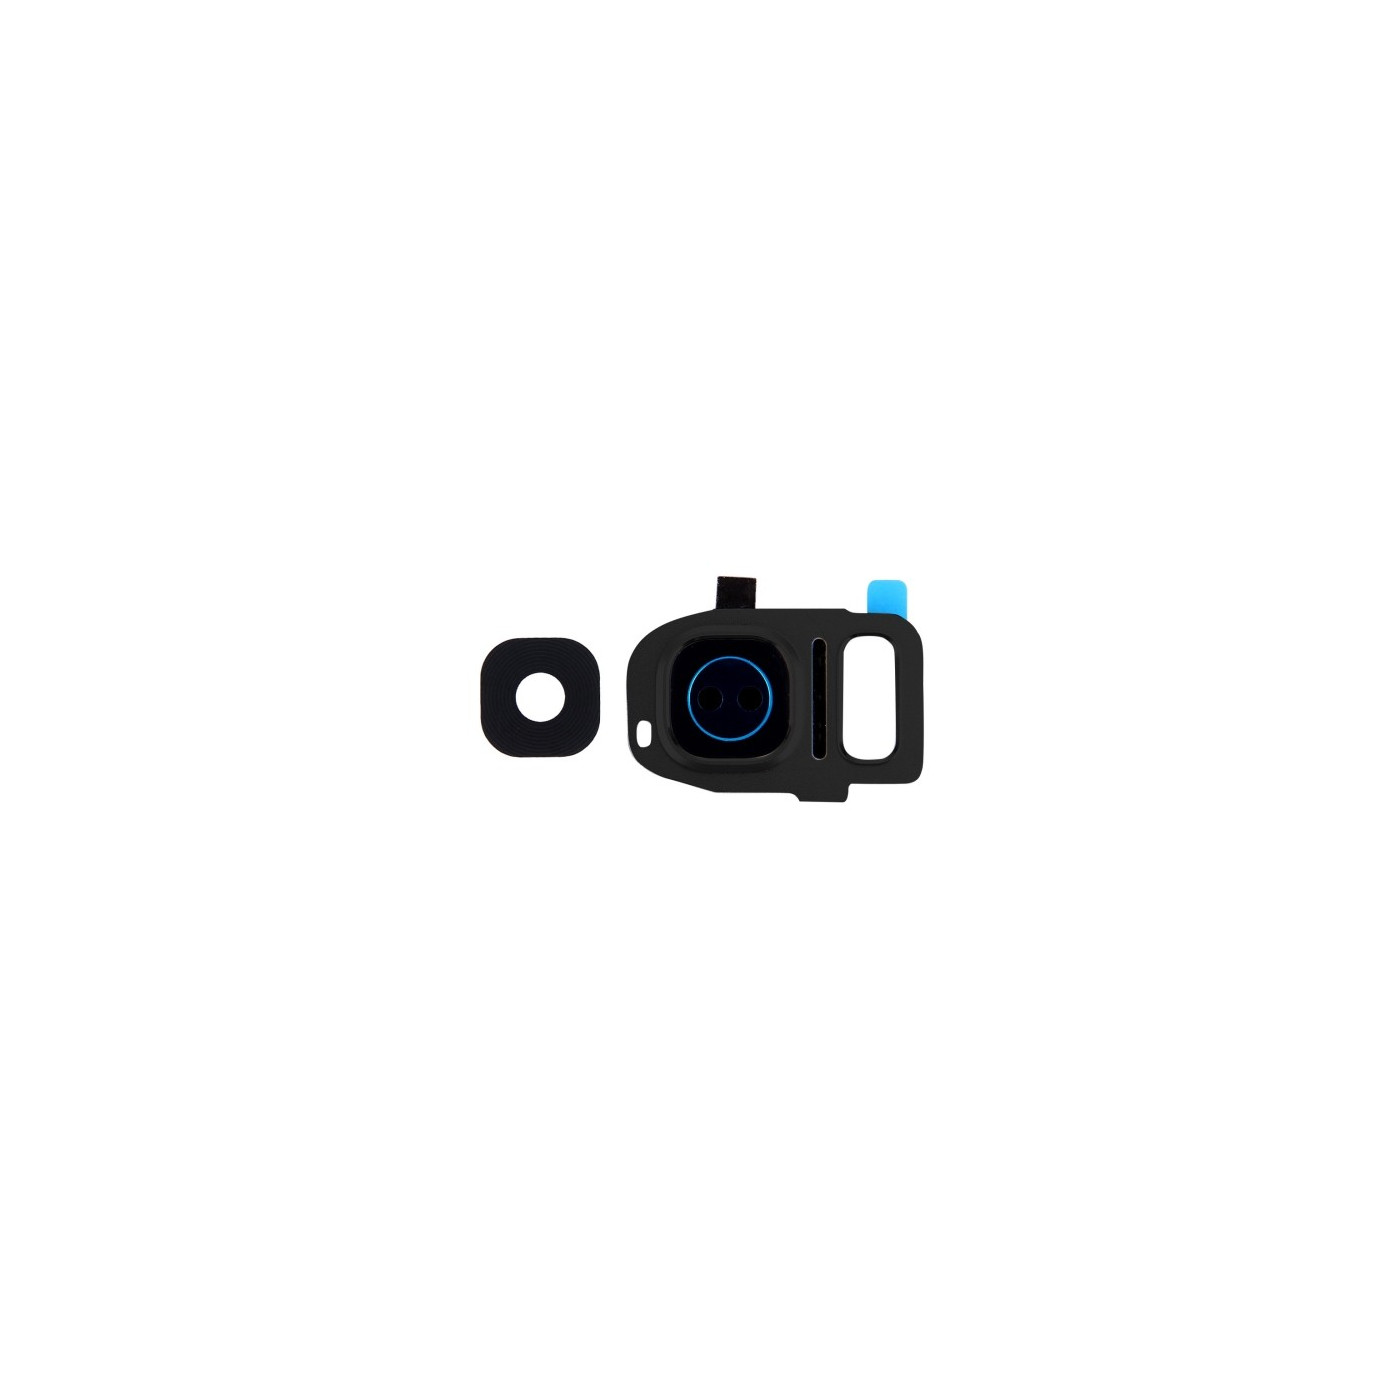 Camera Lens Camera Window Frame frame Gray Samsung Galaxy S7 Edge G935F